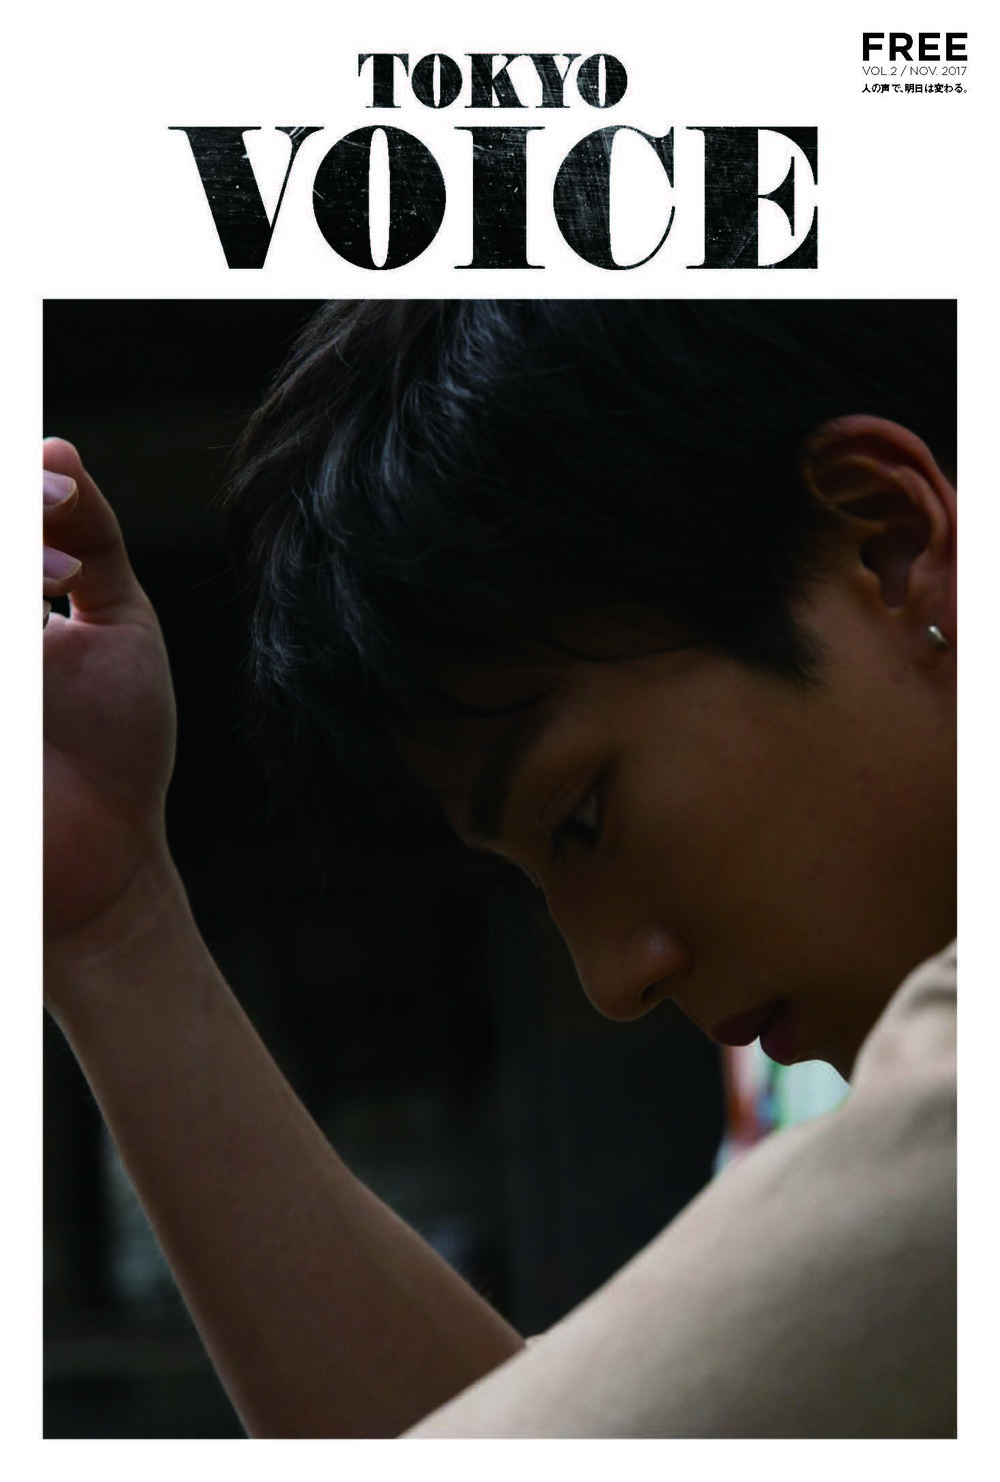 TV_2_1018_文字校用_ページ_01.jpg